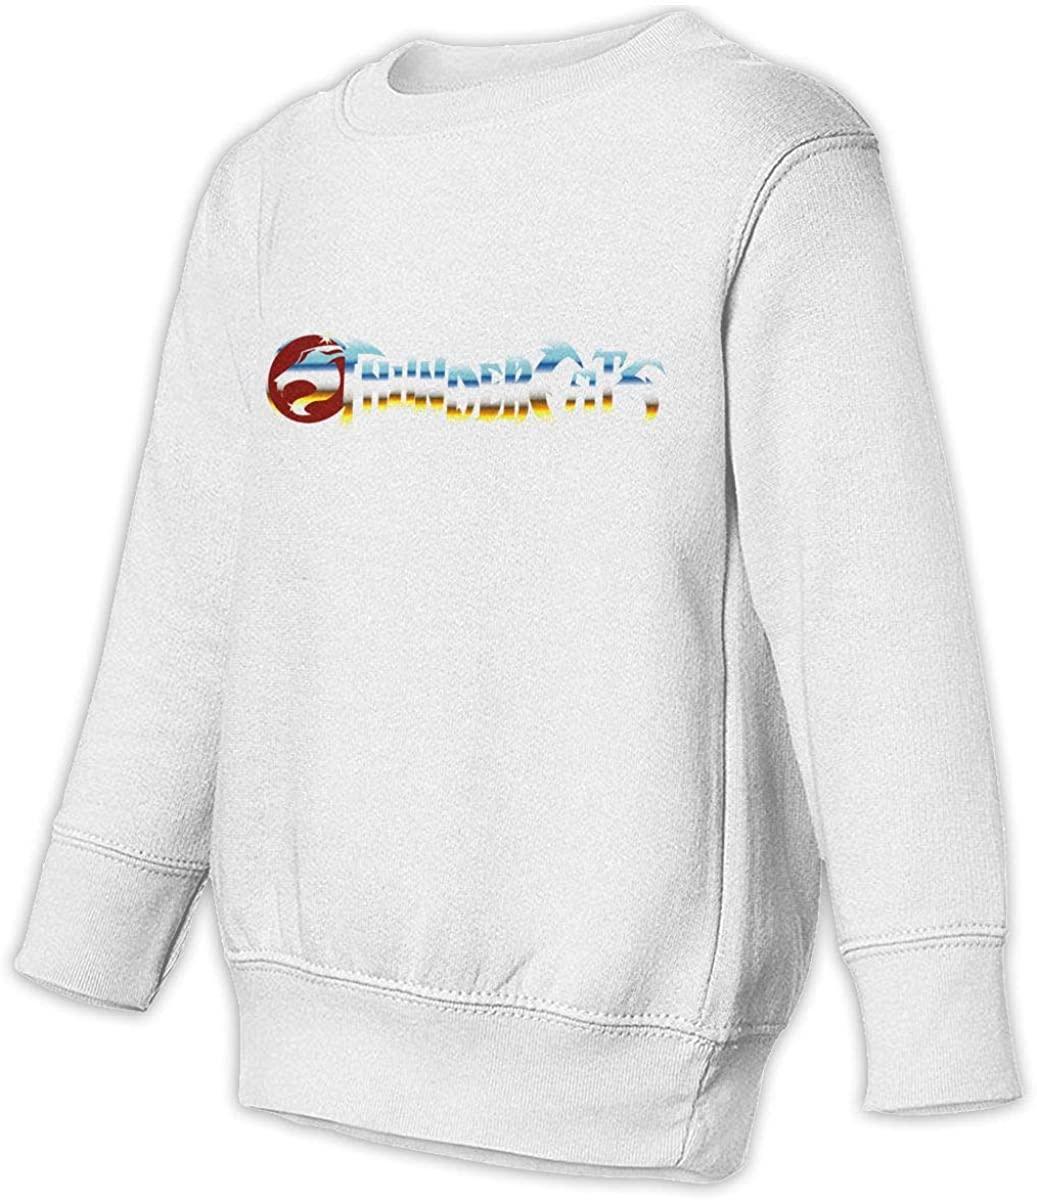 1836 Thundercats Unisex Sweatshirt Youth Boy and Girls Pullover Sweatshirt